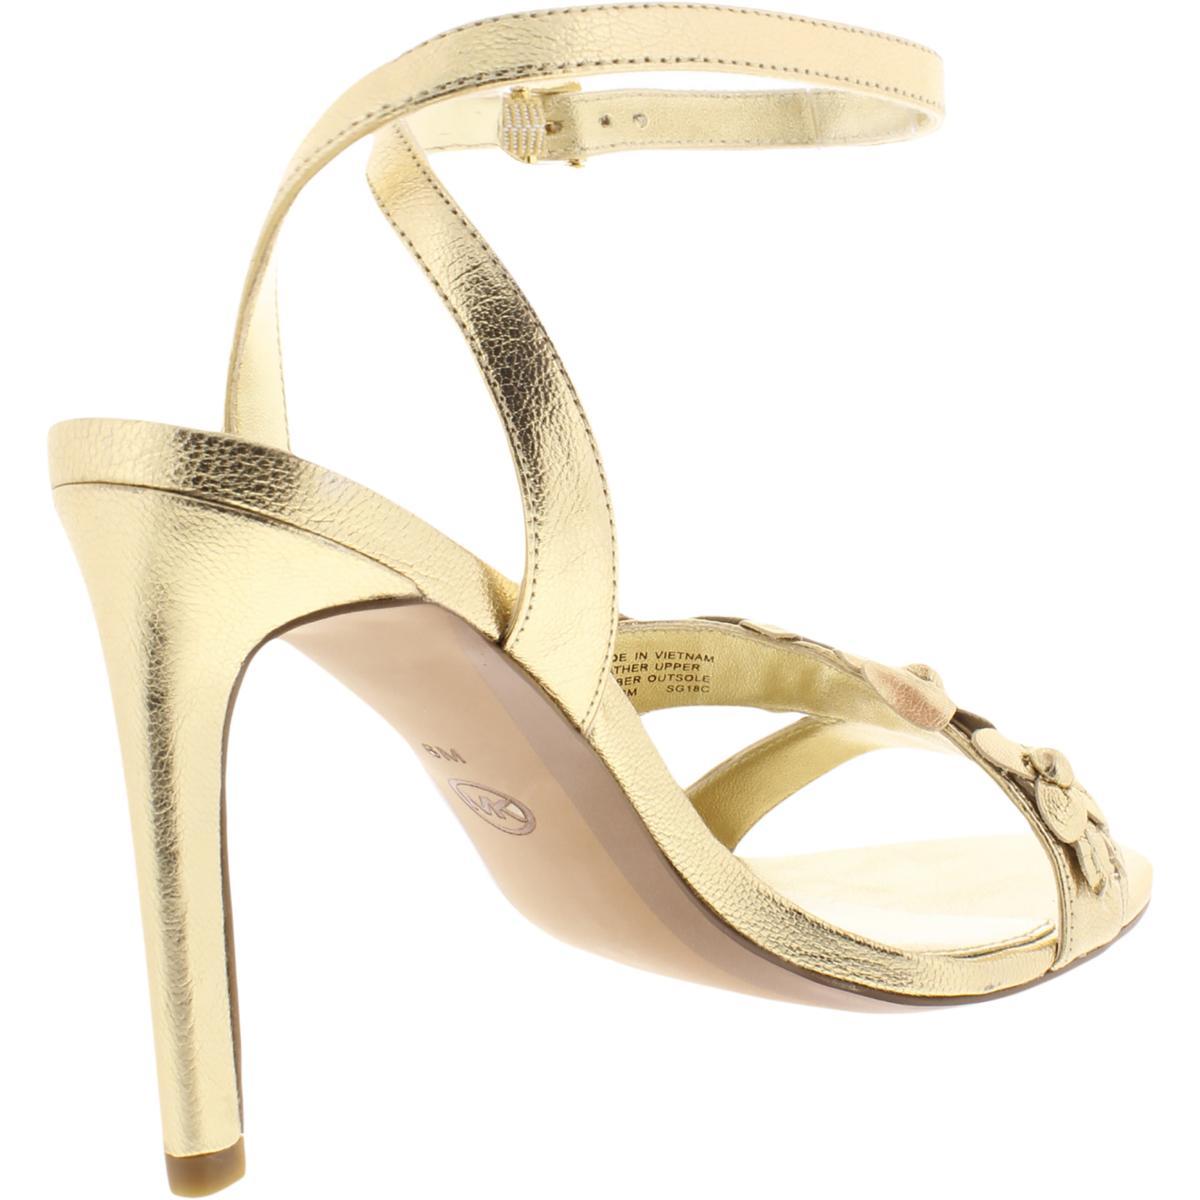 MICHAEL-Michael-Kors-Womens-Tricia-Leather-Dress-Sandals-Shoes-BHFO-6011 thumbnail 4